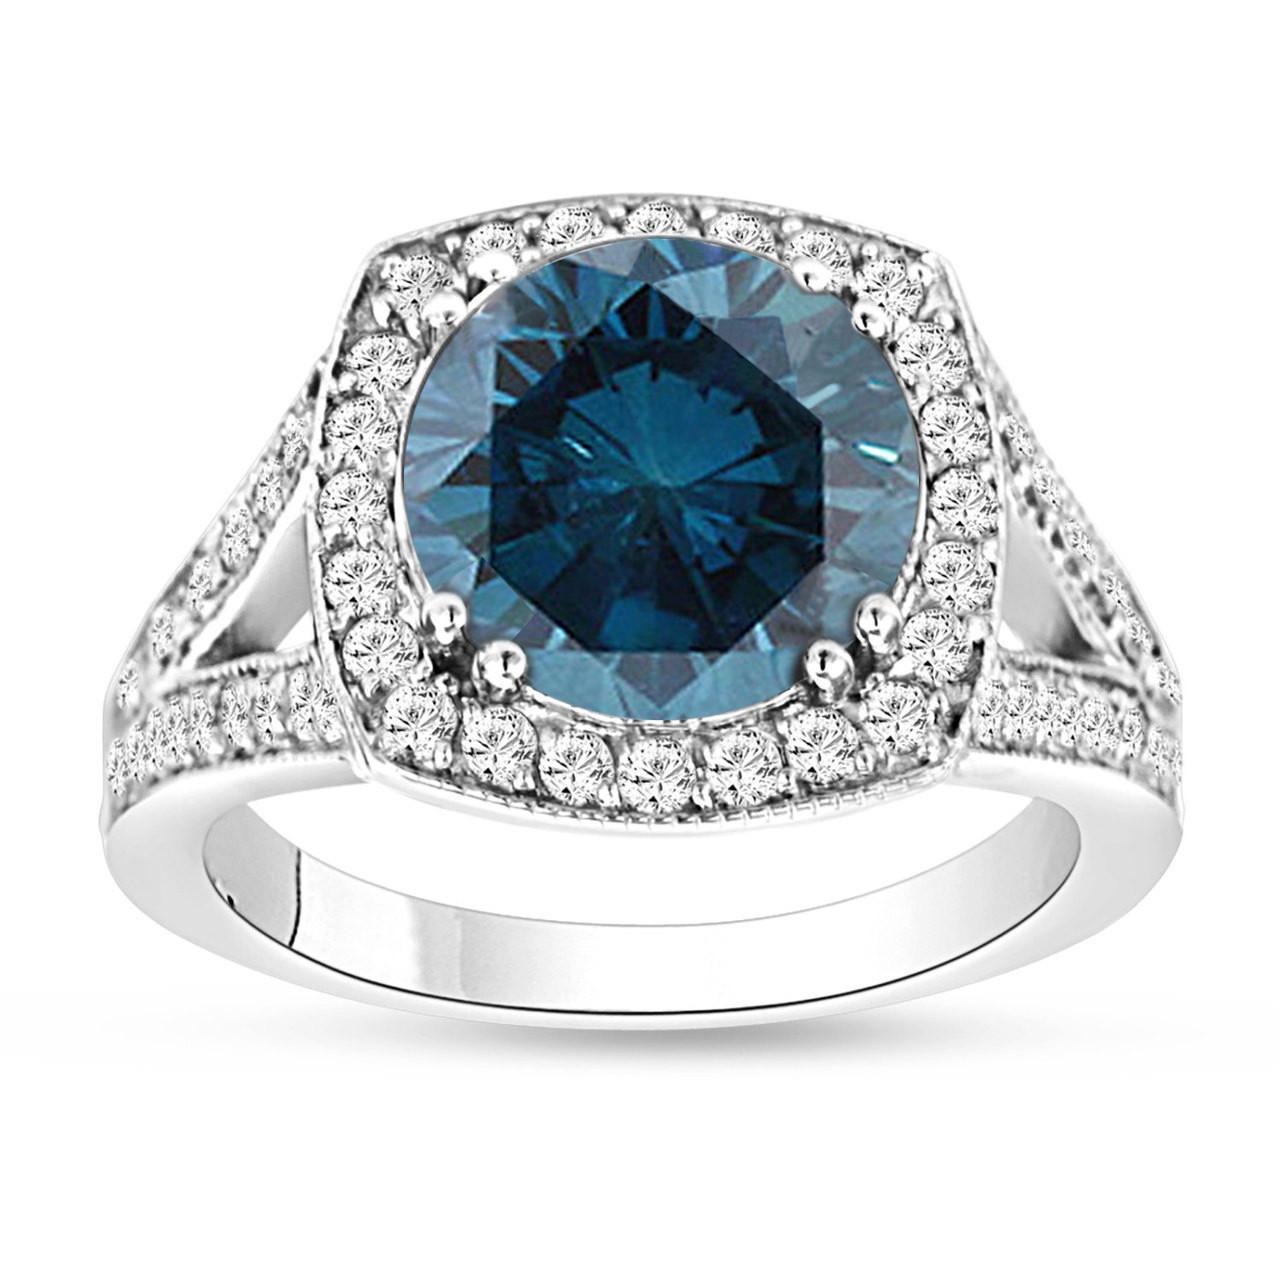 3.83 Carat Fancy Blue Diamond Engagement Ring 14K White ...